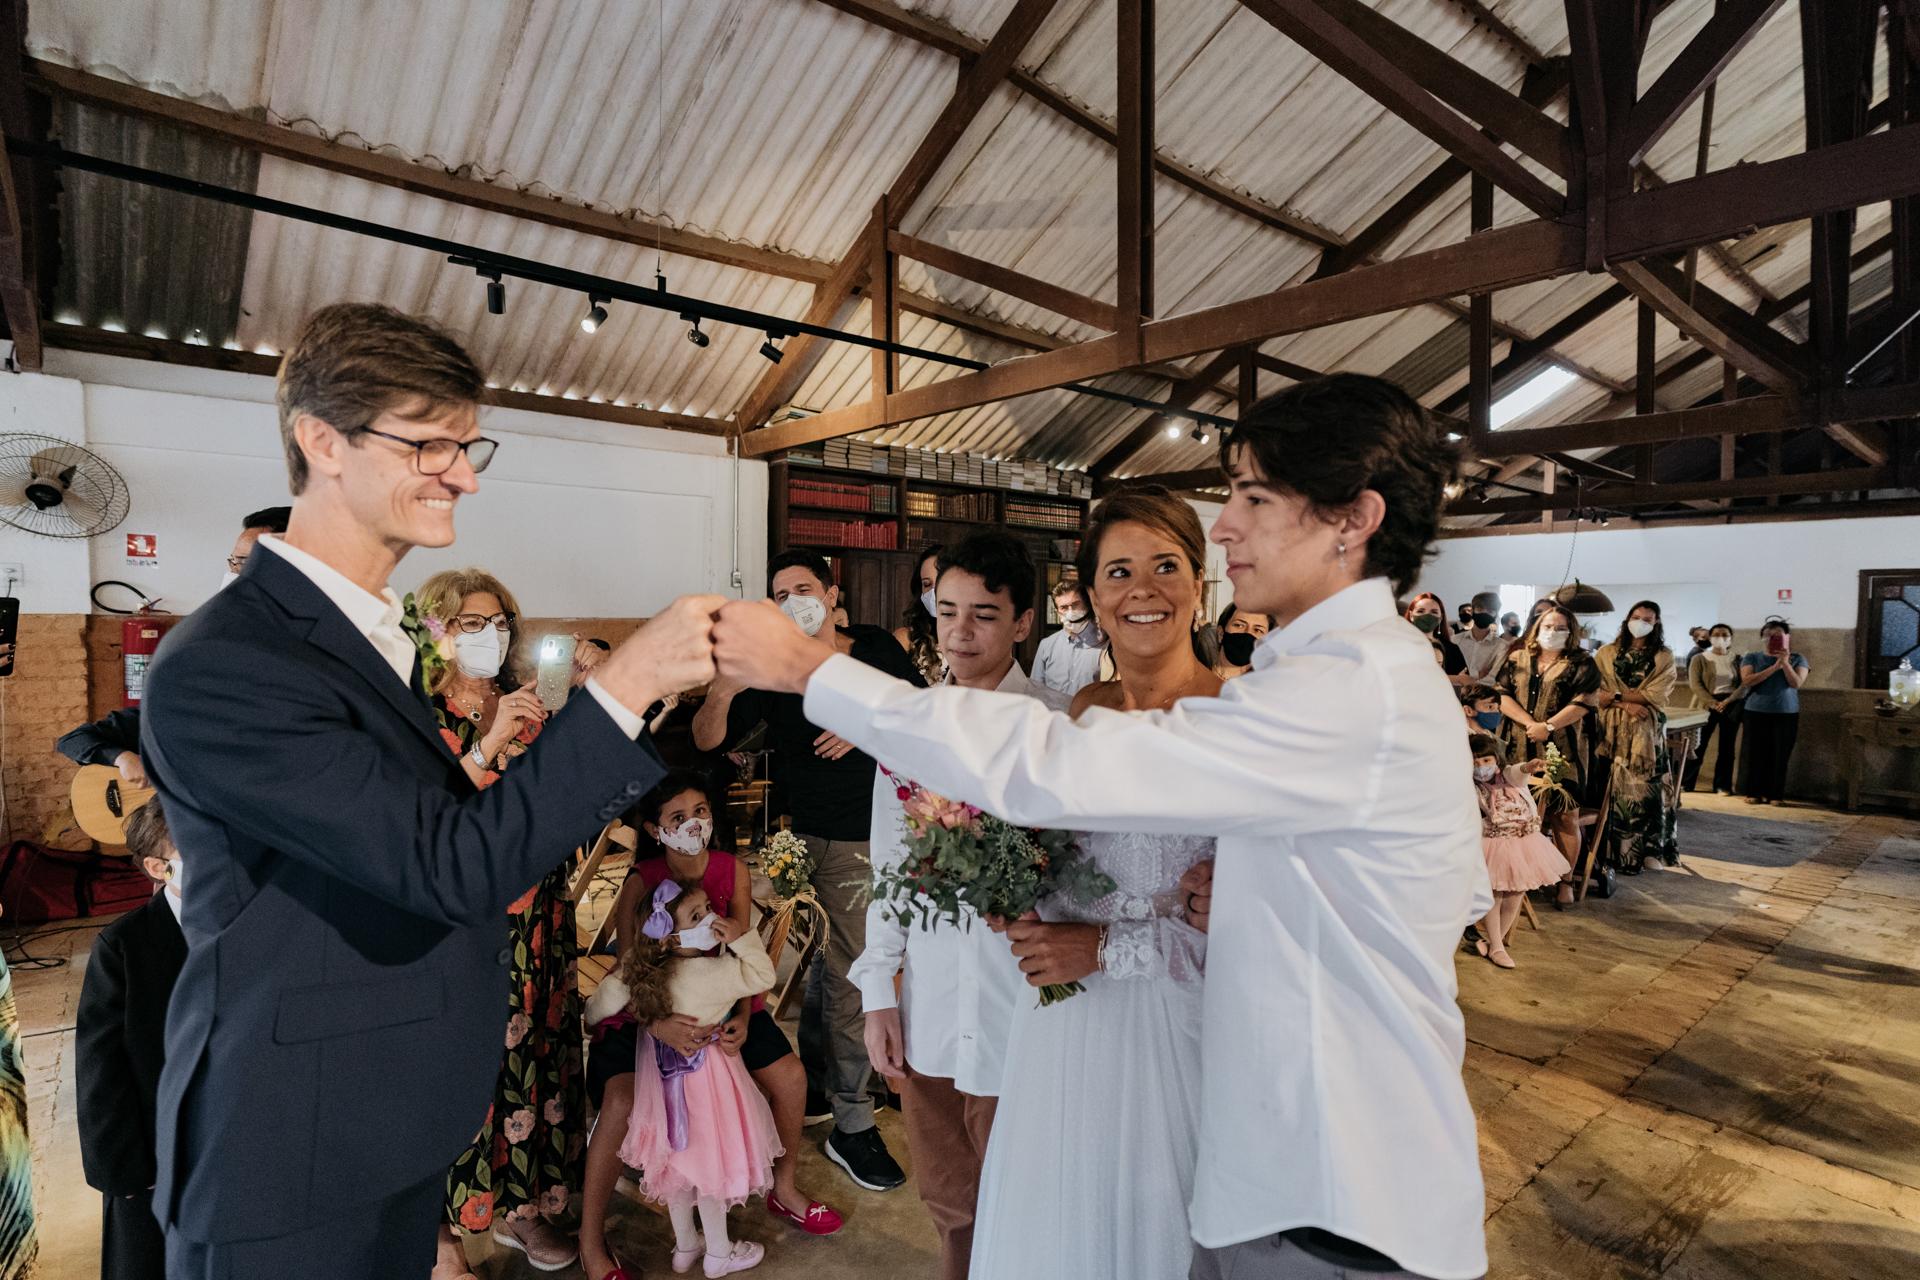 Weddings at Maristela Farm, Sao Paulo Brazil Photography | The groom gives the bride's son a fist bump